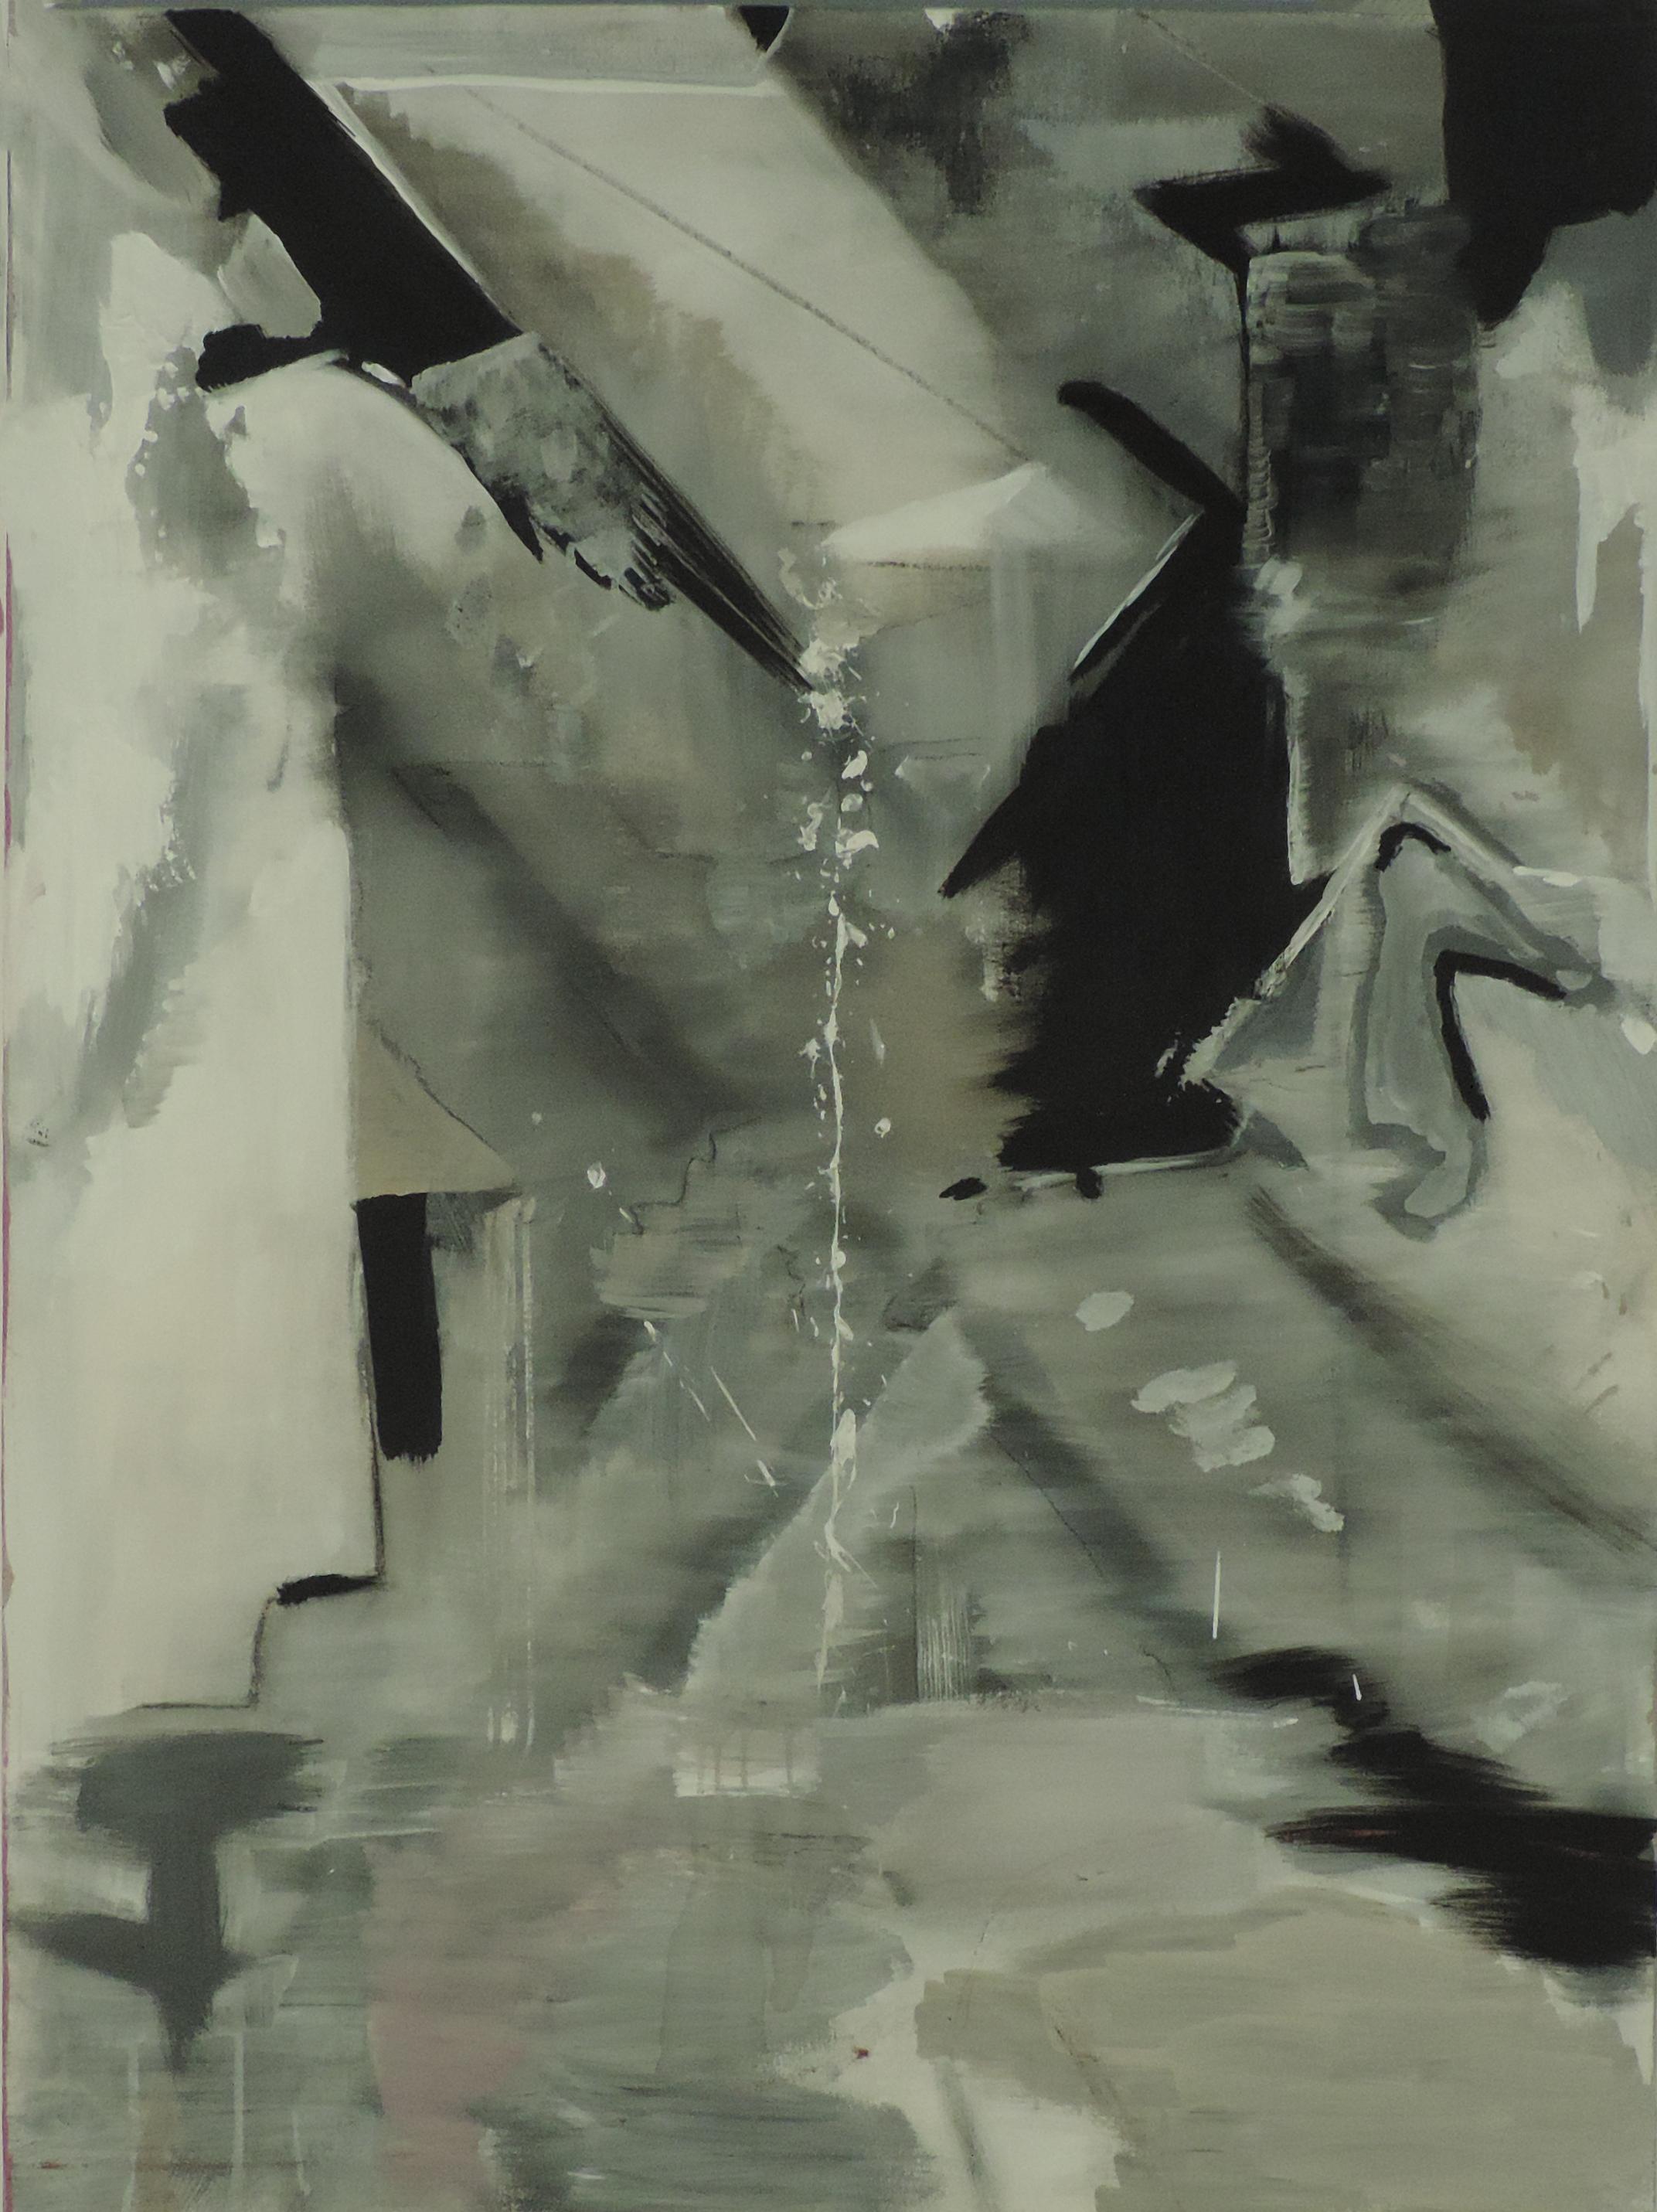 So Architectural  oil on canvas. 4 feet x 3 feet